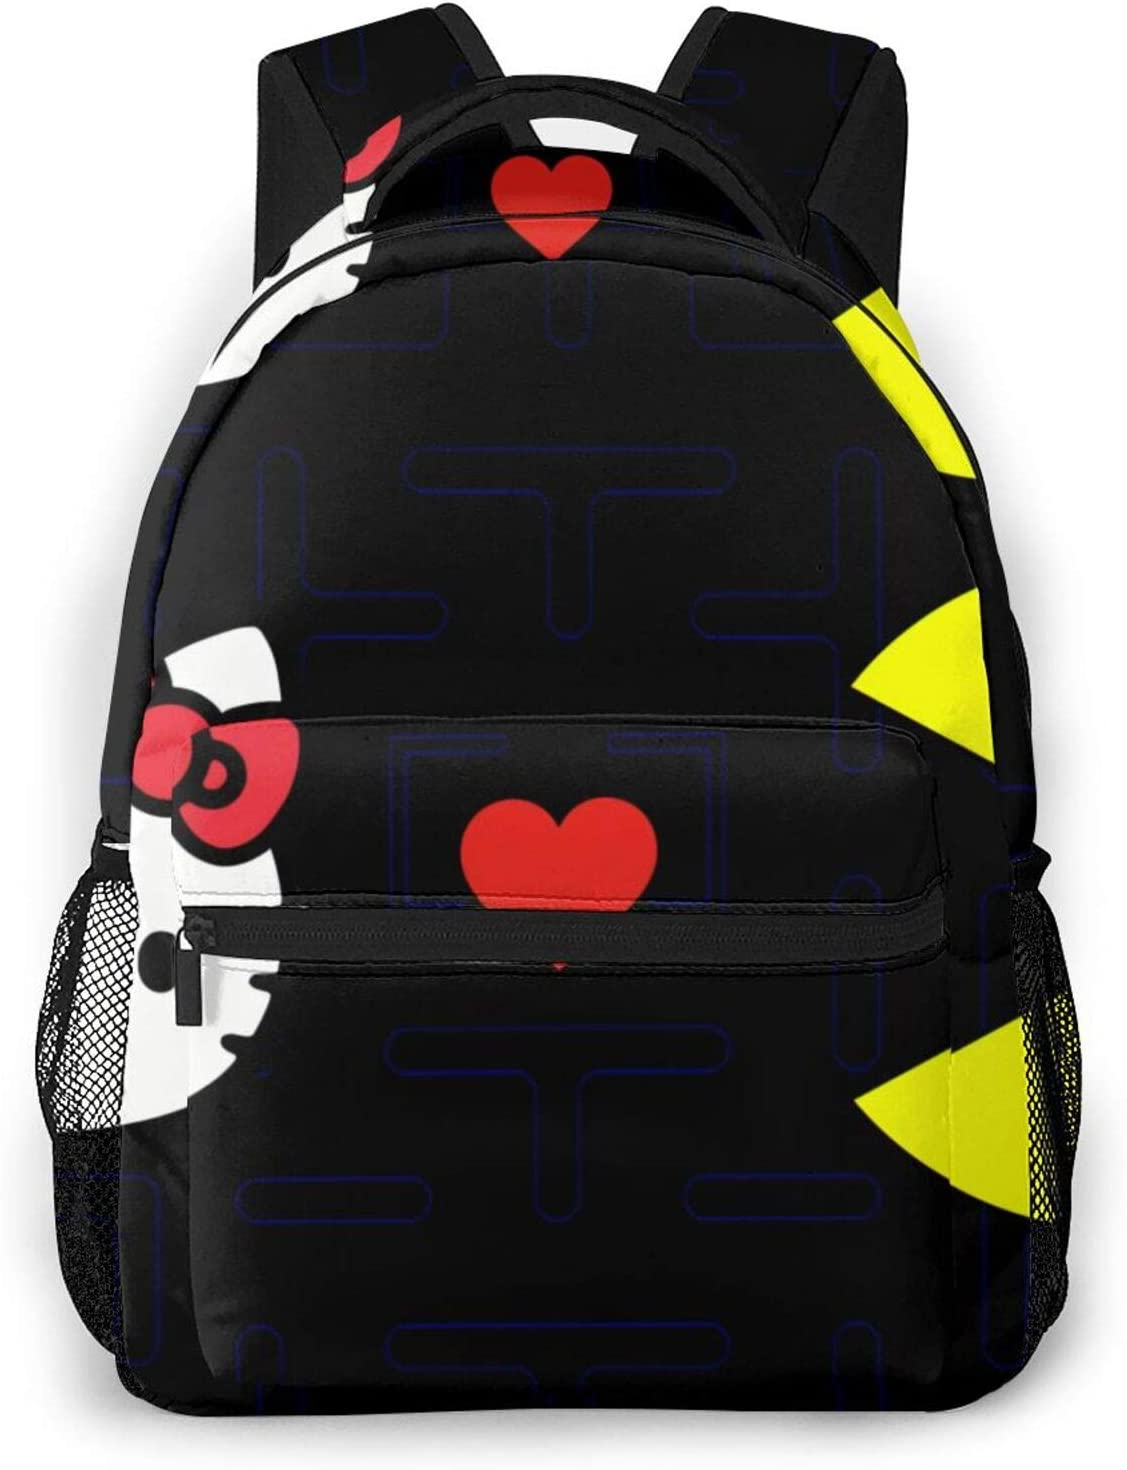 Pac-Man Met Hellokitty Travel Bags 3d Pattern Backpack School Laptop Bookbag Lightweight Multi-Function And Water Resistant For Teens